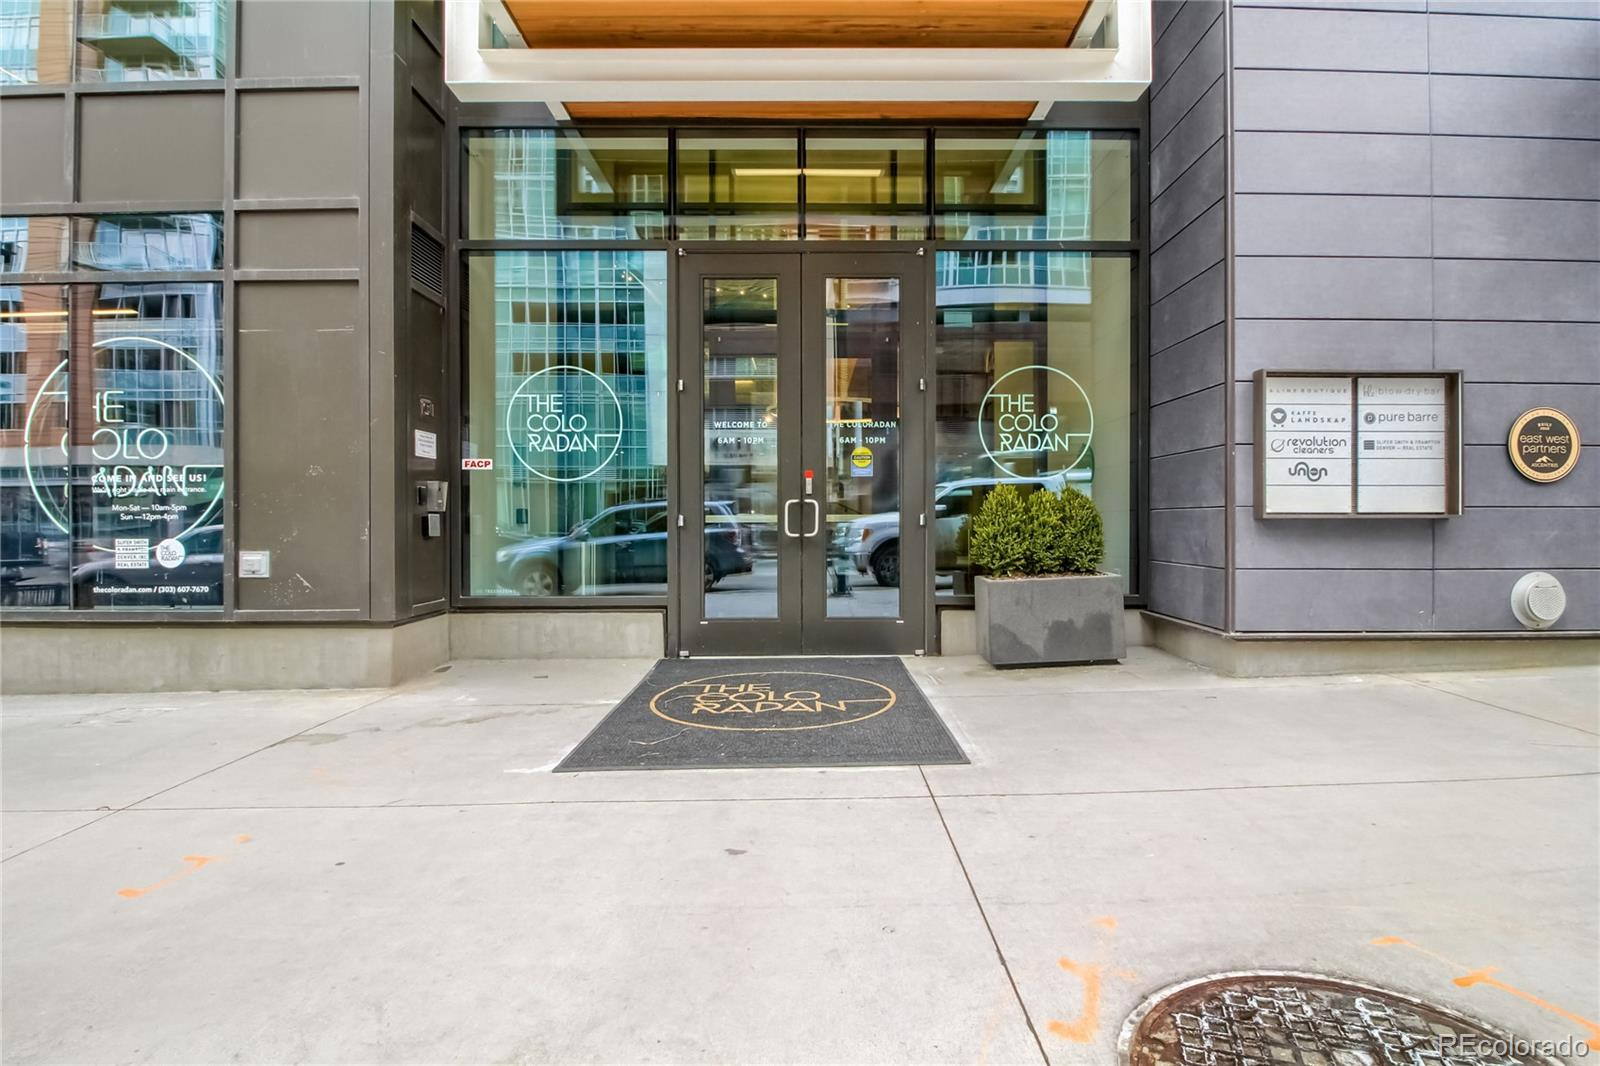 MLS# 3409268 - 2 - 1750 Wewatta Street #925, Denver, CO 80202